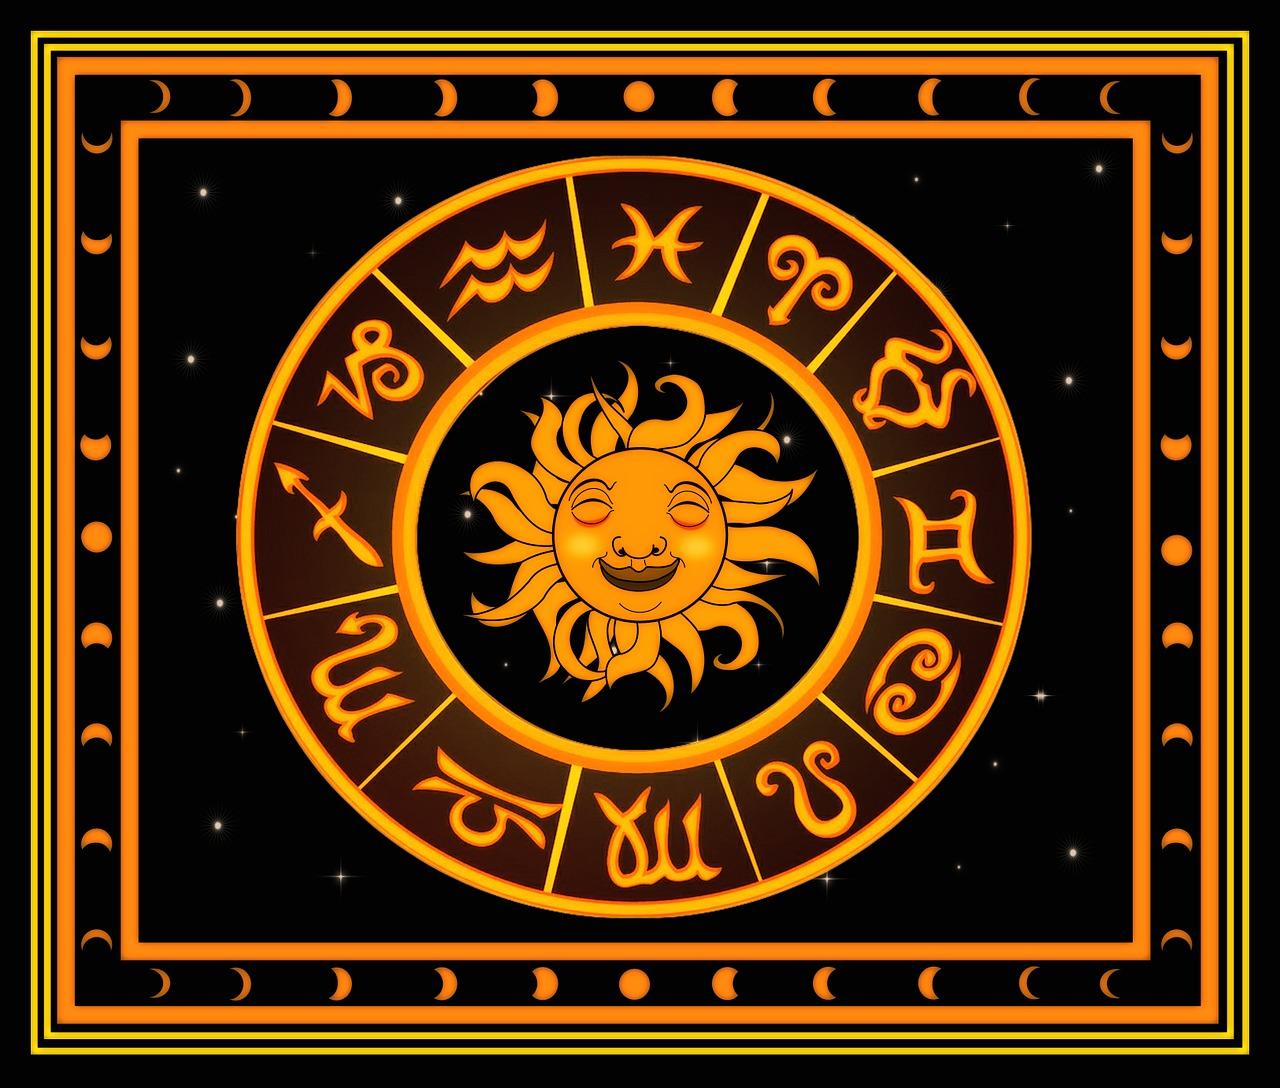 Veliki horoskop za maj: Ova dva znaka će doživeti prelomne trenutke u ljubavi!